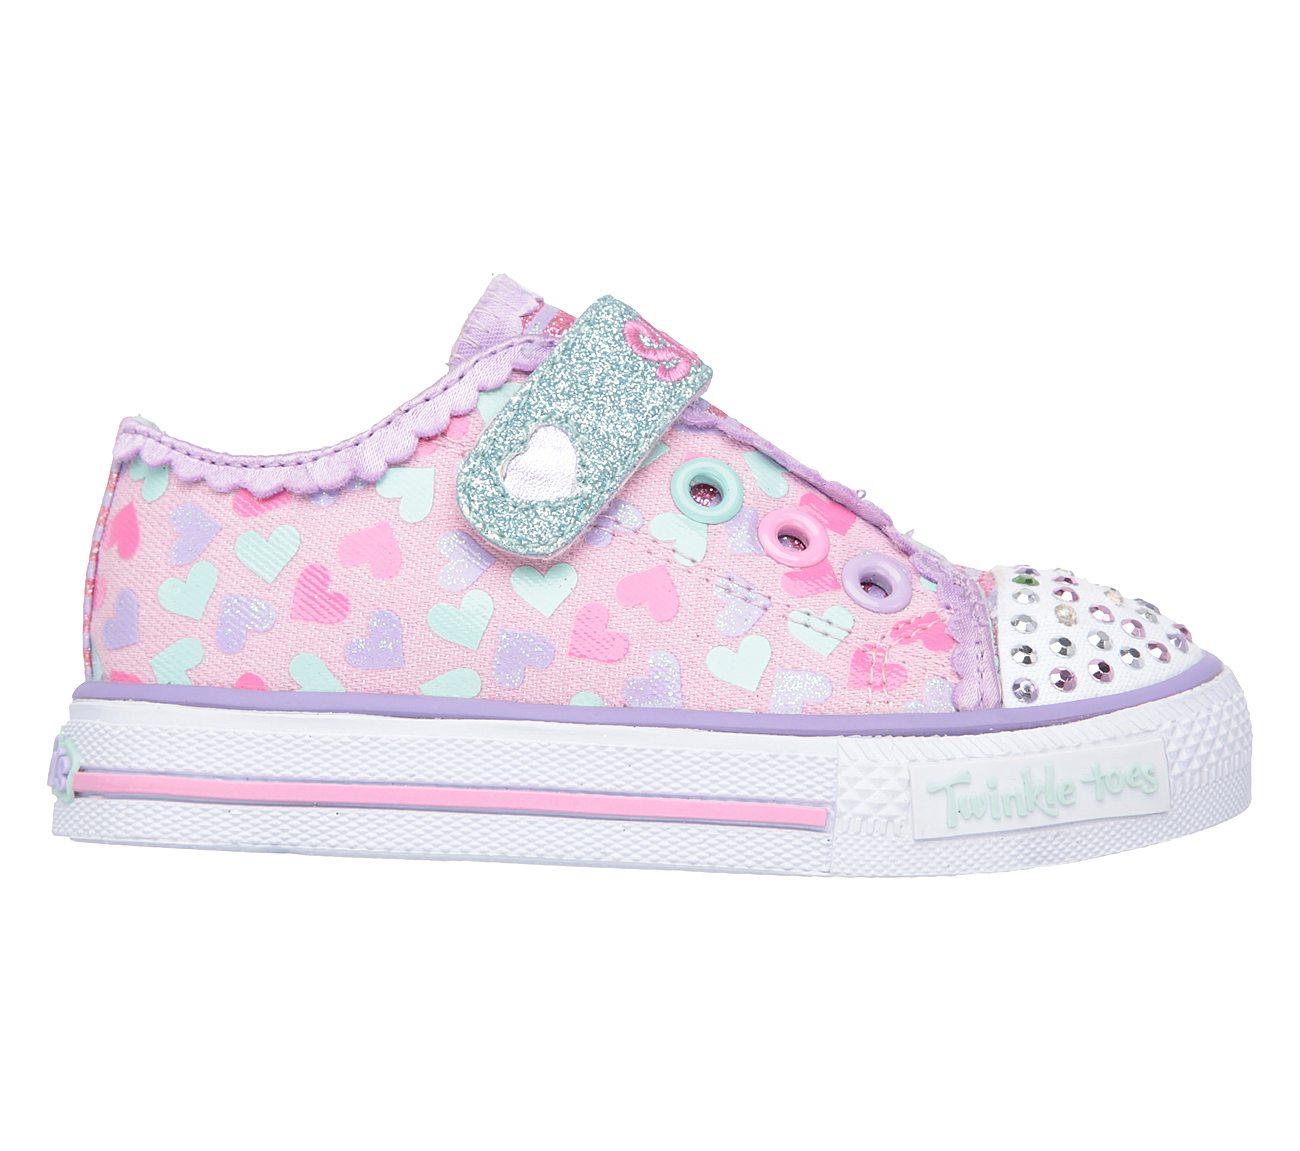 Twinkle Toes: Shuffles - Shimmer Pop